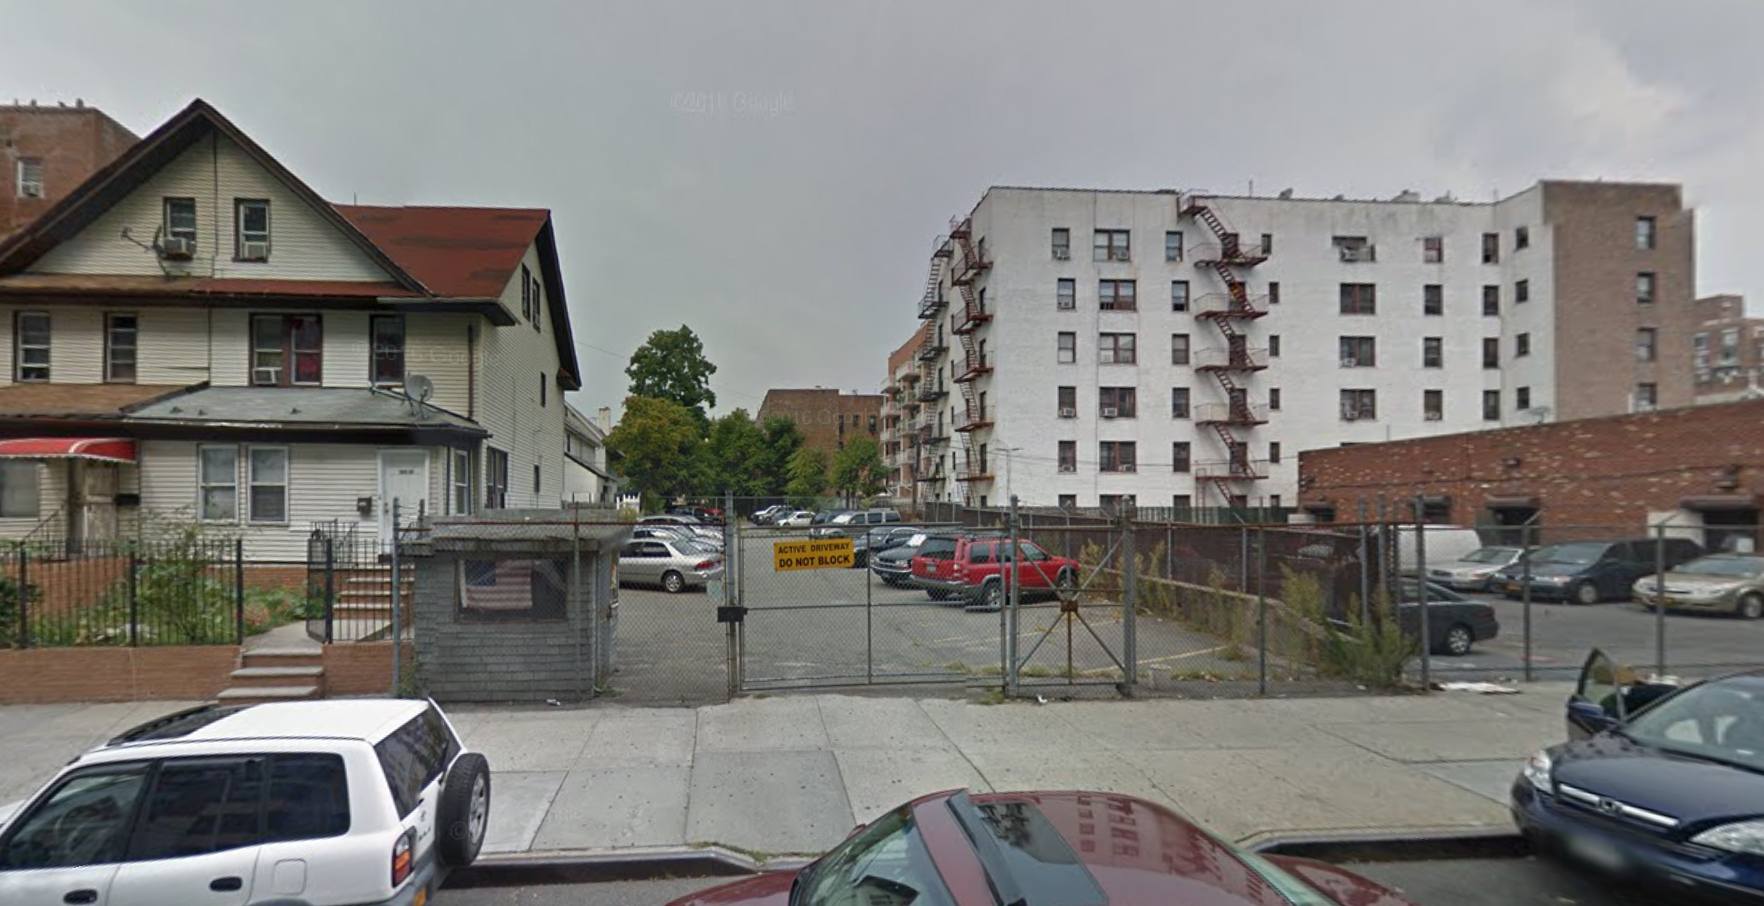 153-33 89th Avenue, image via Google Maps